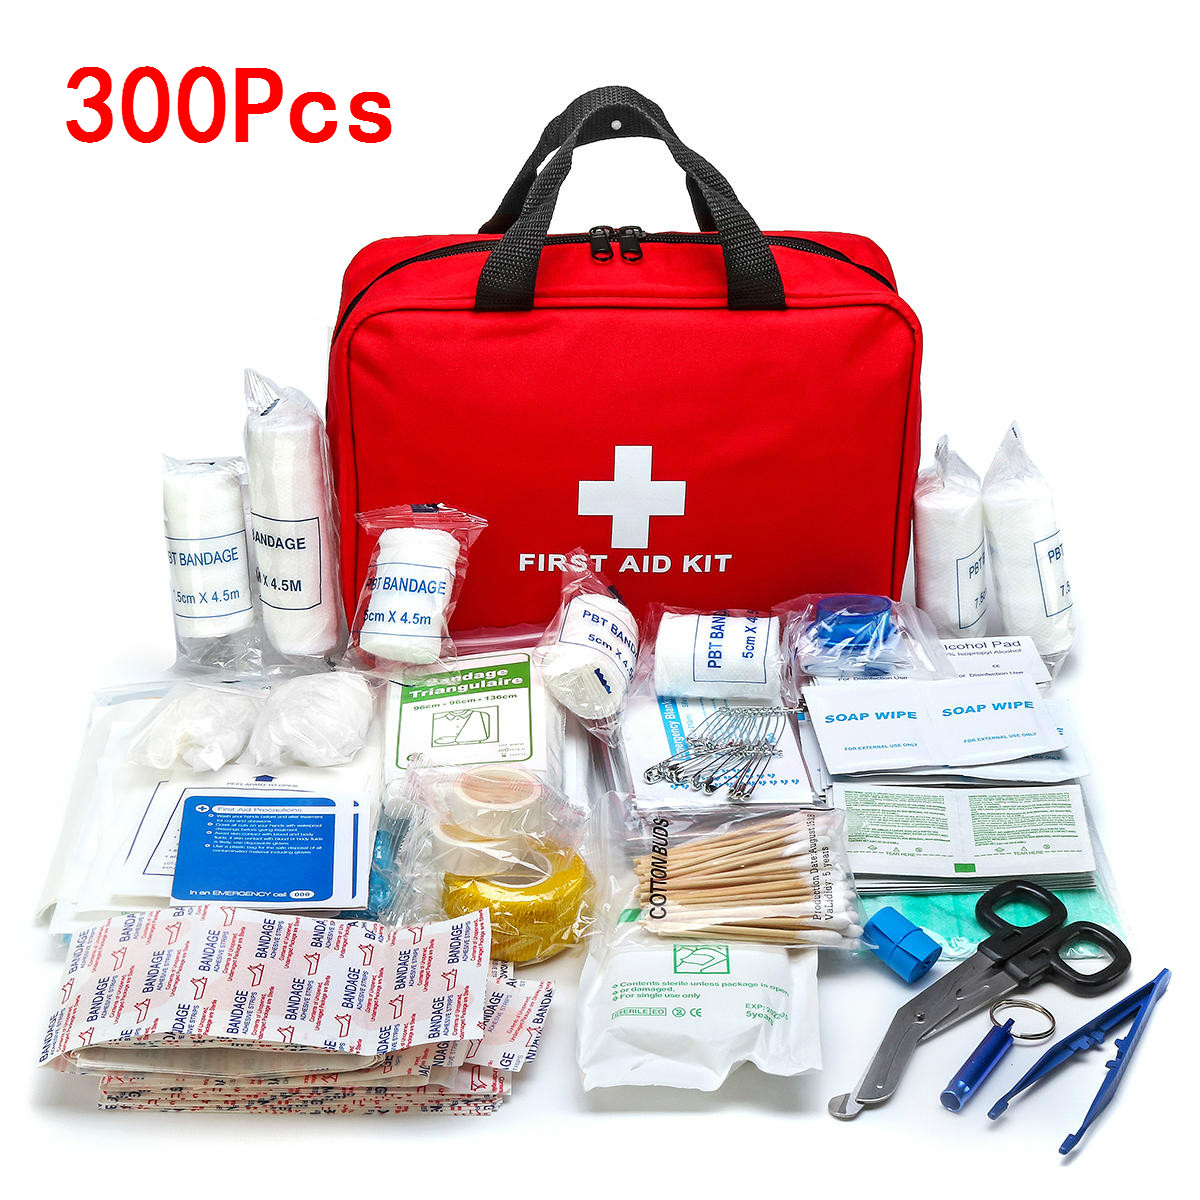 Tragbare 16-300 Pcs Notfall Überleben Set First Aid Kit für Medikamente Outdoor Camping Wandern Medizinische Tasche Notfall Handtasche